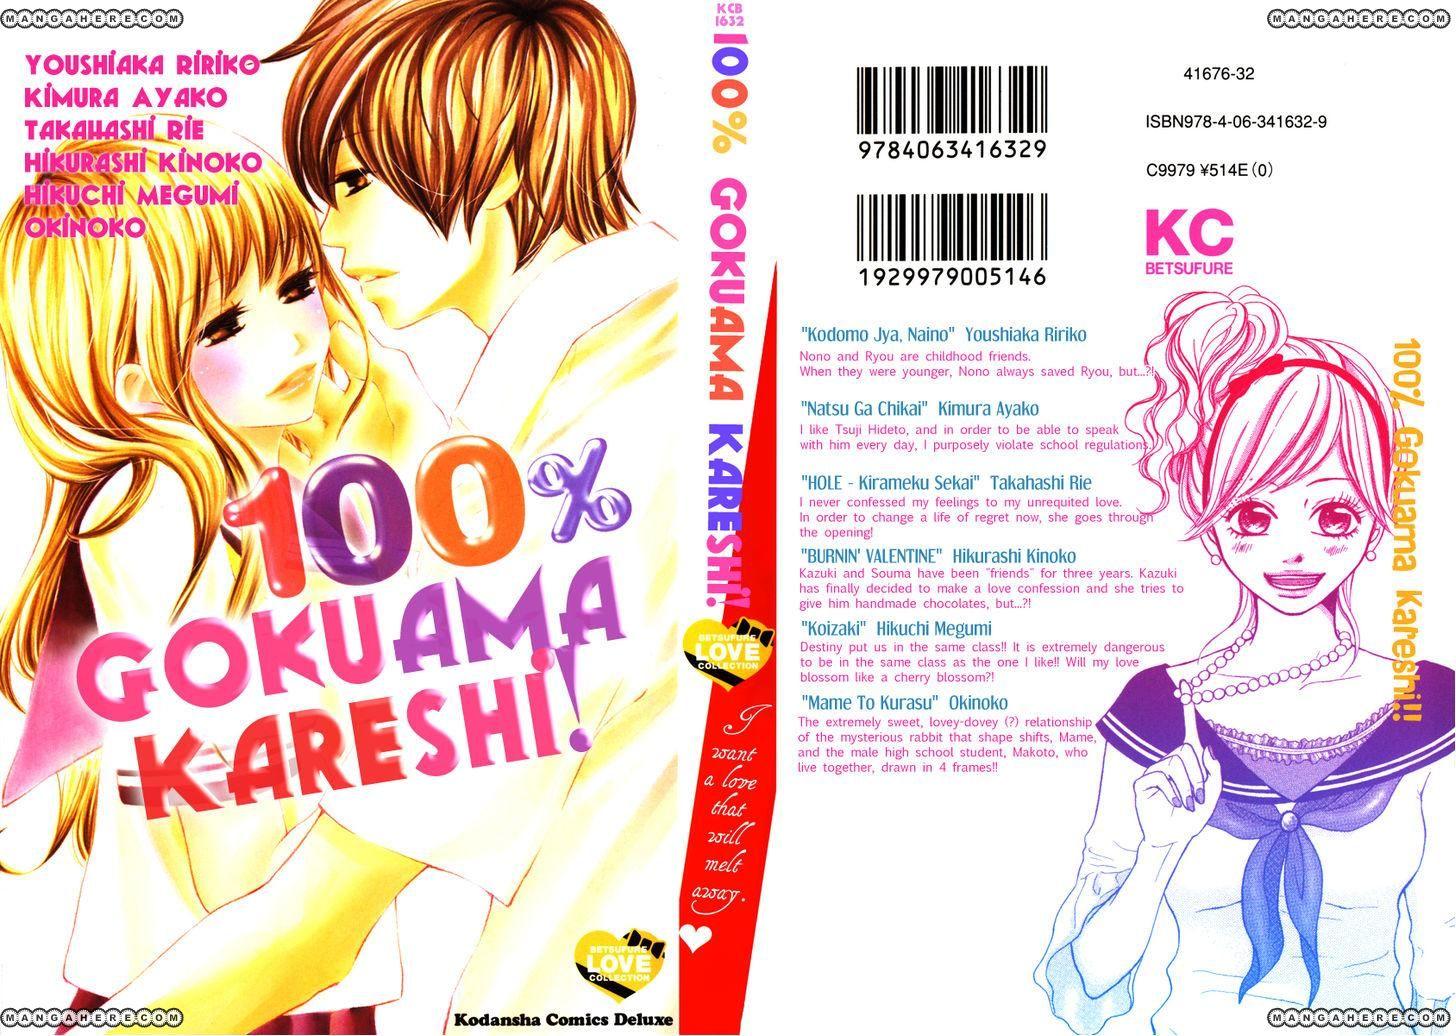 100% Gokuama Kareshi! 1 Page 1